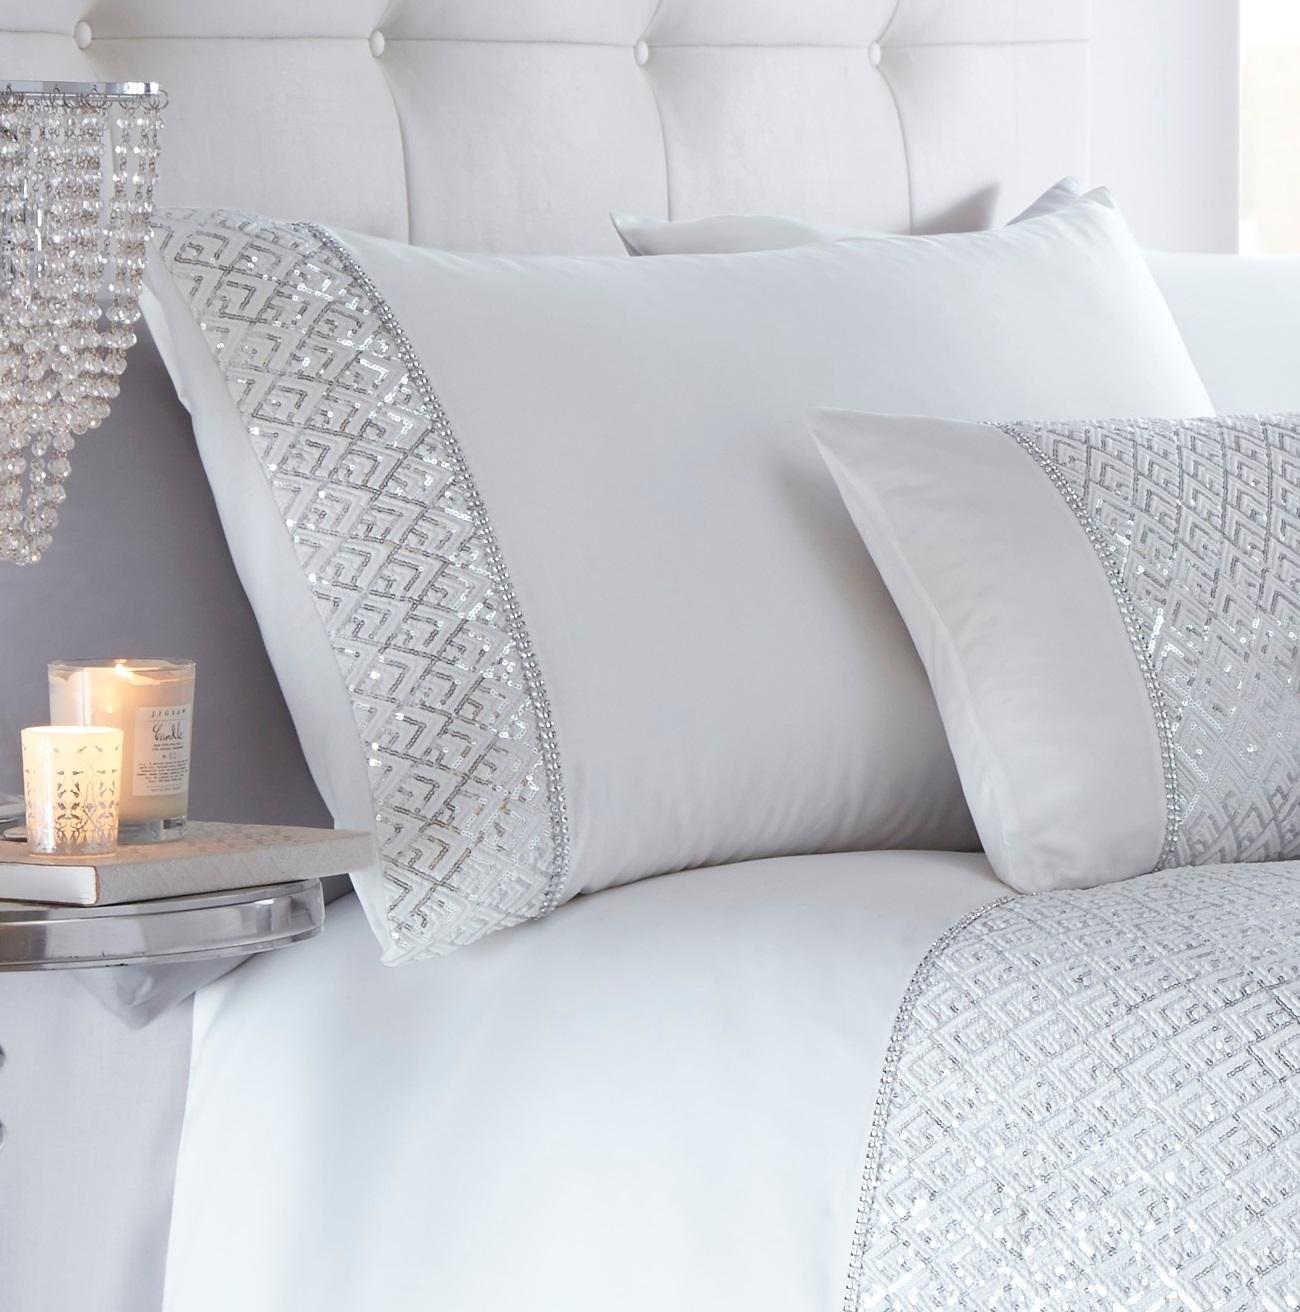 cover bedding manchester harvey by sheridan pillowcase white set norman fernvale european zealand duvet covers new